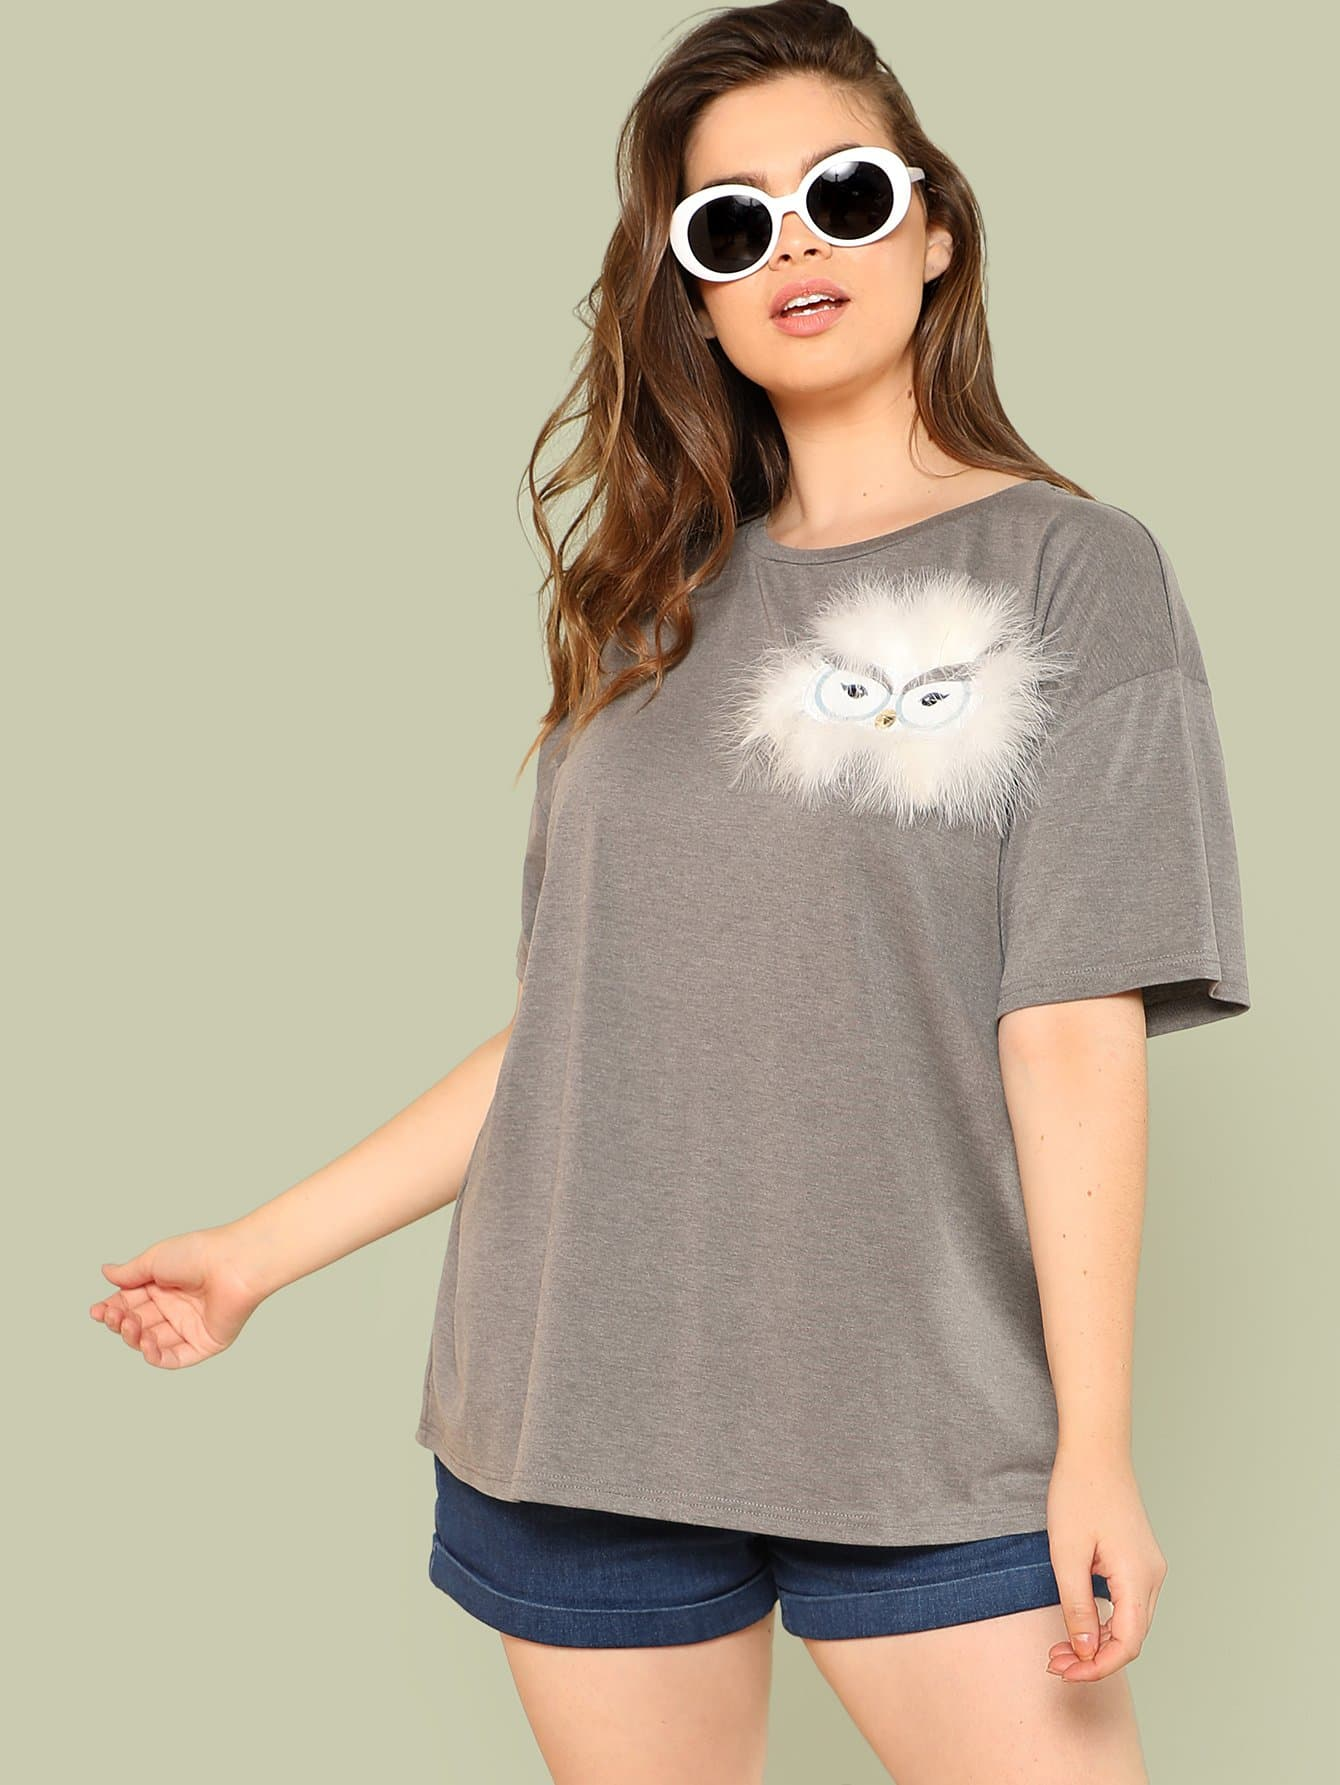 Contrast Faux Fur Fox Tee drop shoulder contrast faux fur sleeve sweatshirt